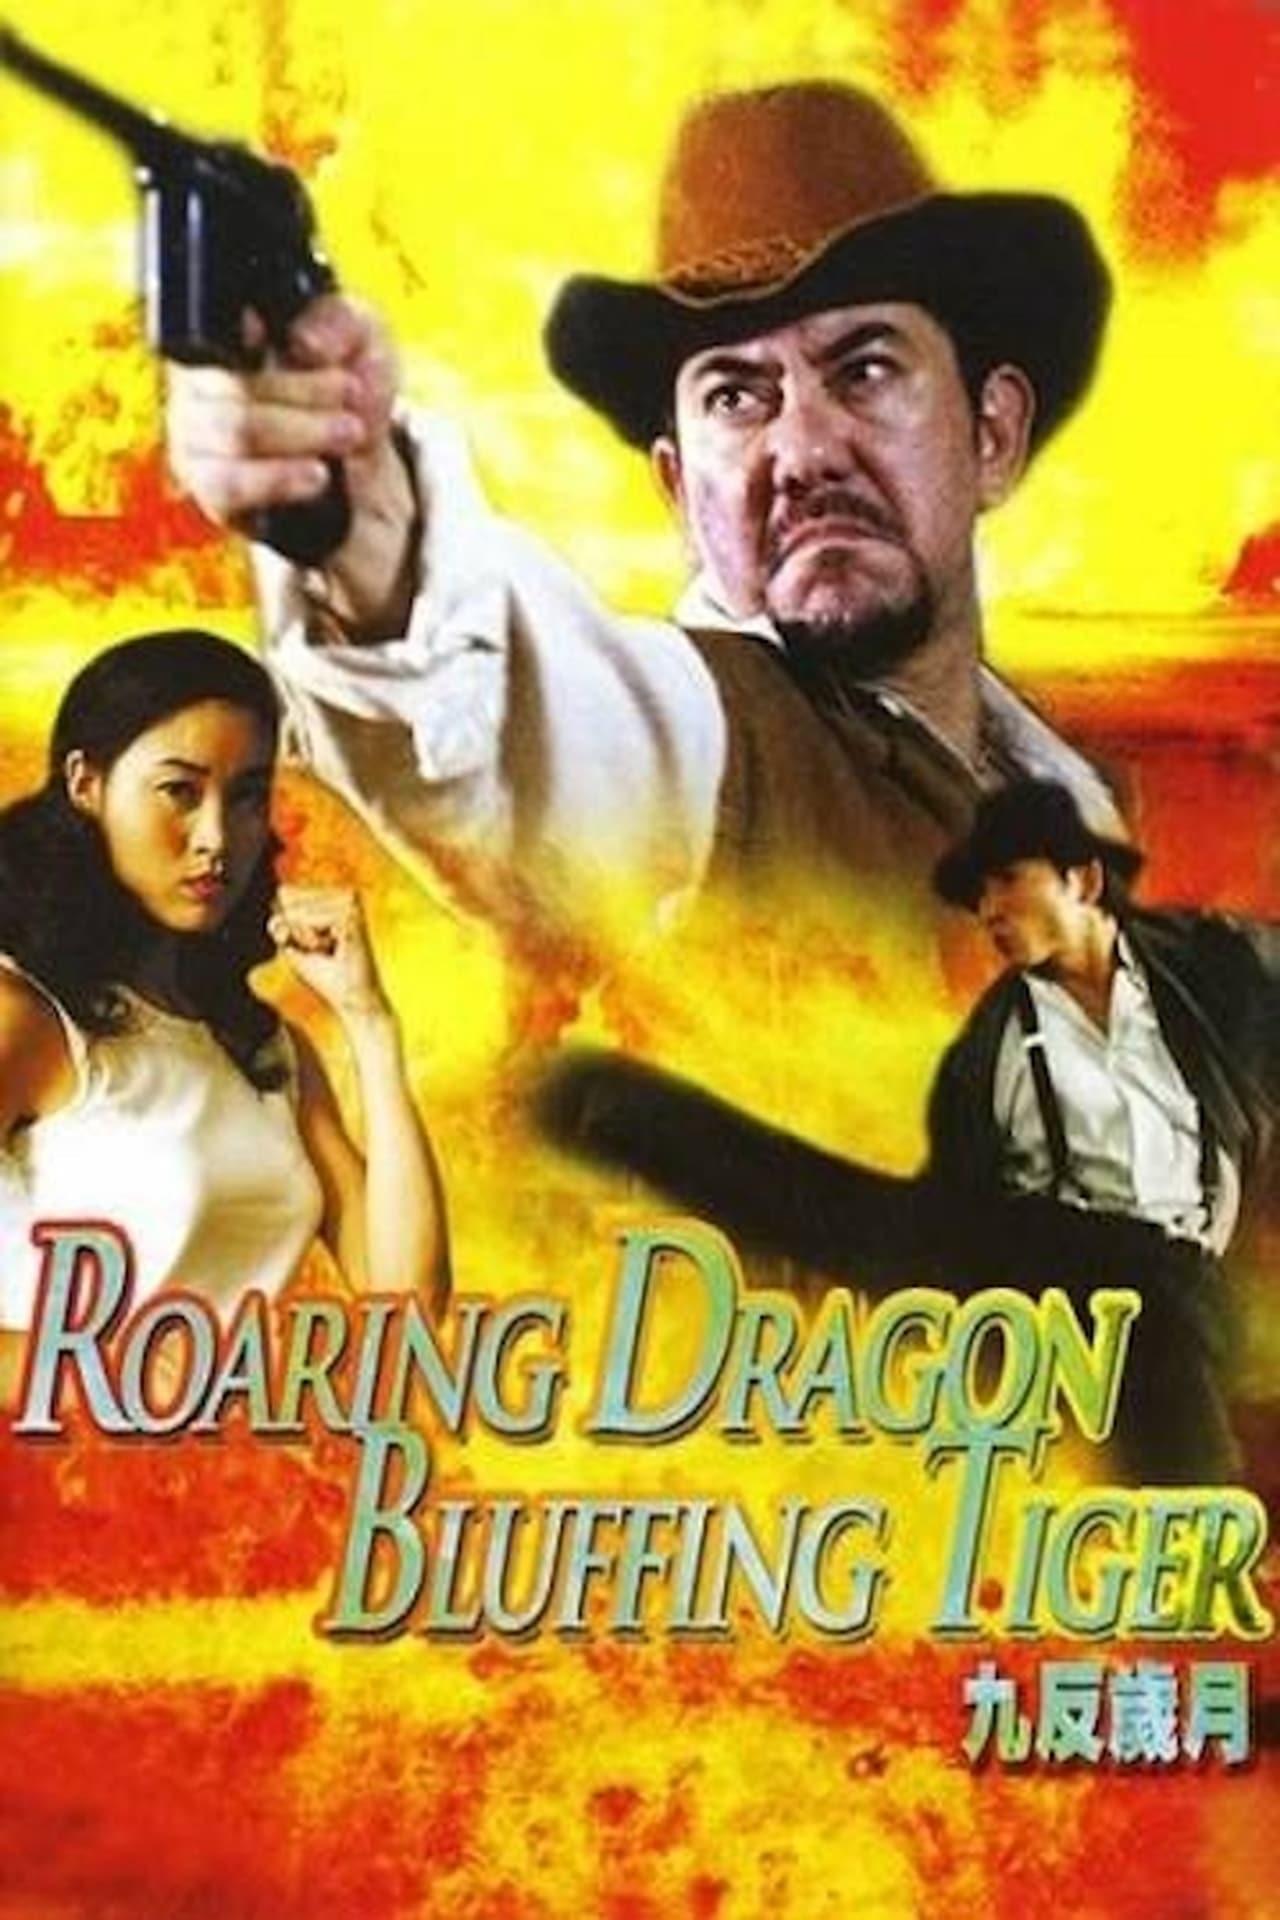 Roaring Dragon, Bluffing Tiger